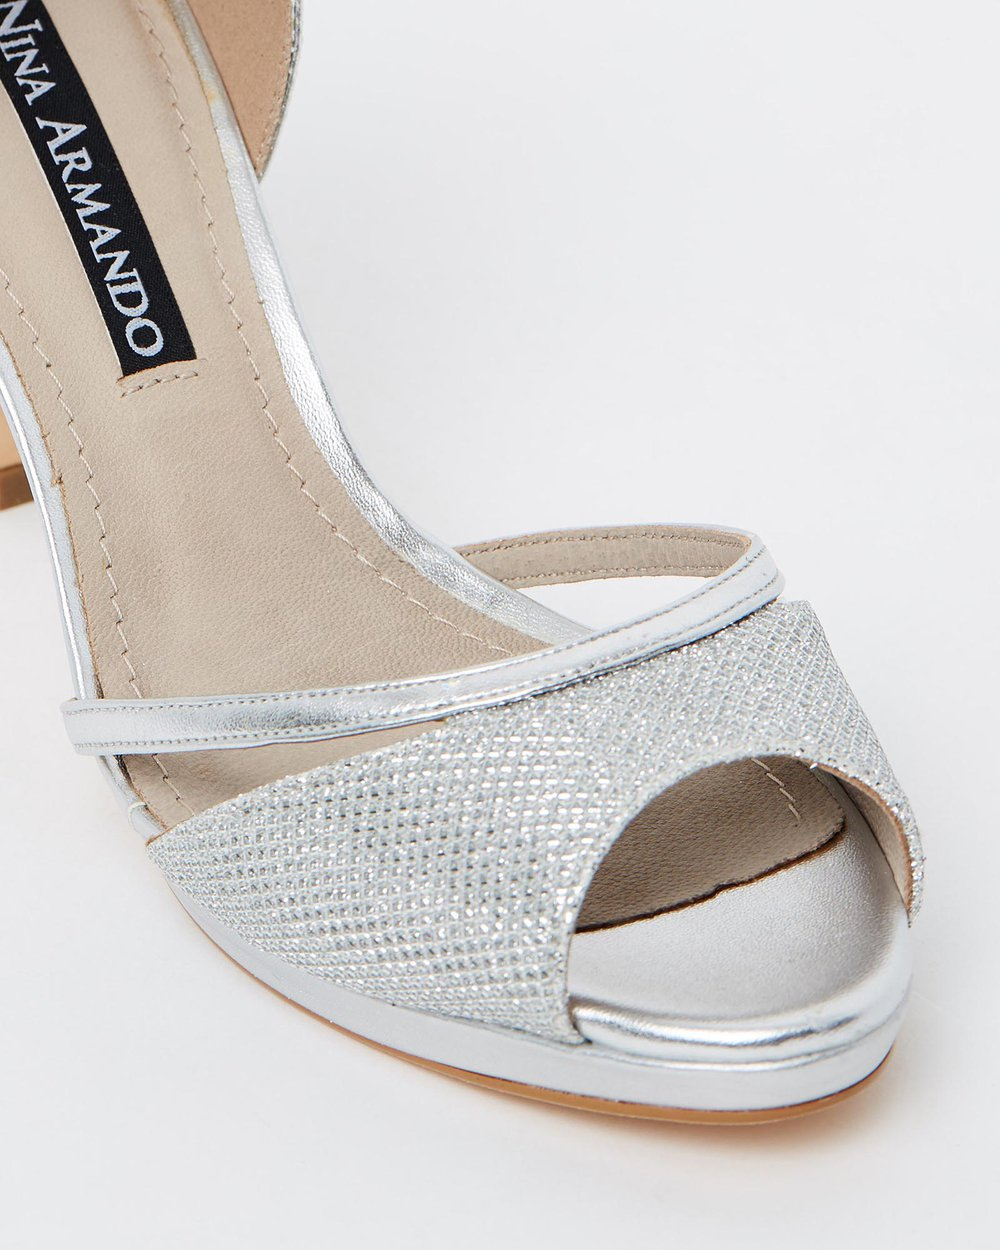 Lana - Silver